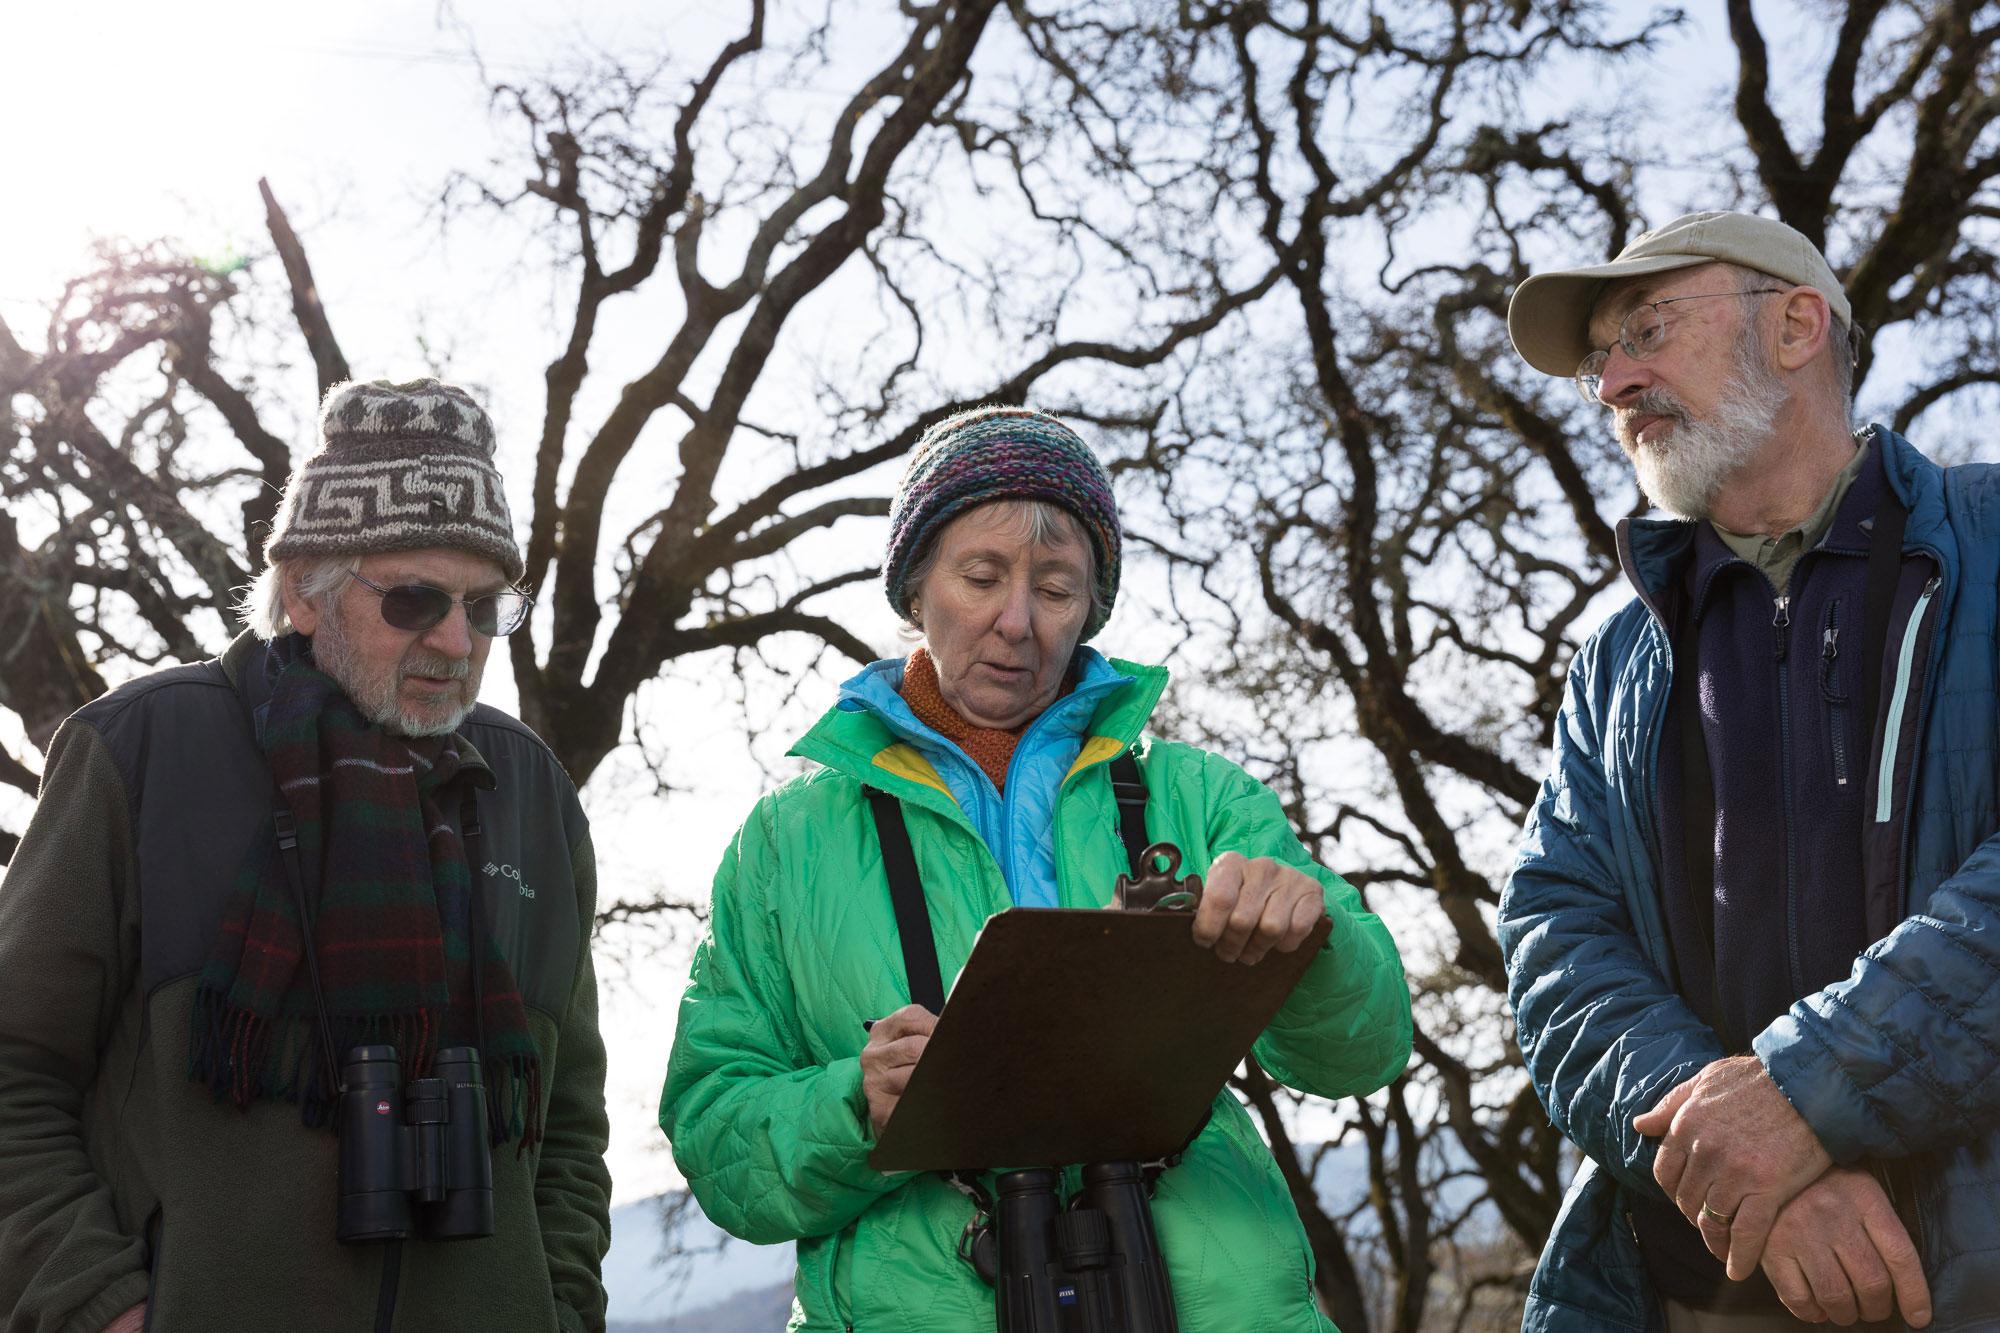 Rodney Jackson, Ann Howland, and David Leland tally birds on the border of Stone Edge Farm and Silver Cloud Vineyard. Ryan Young